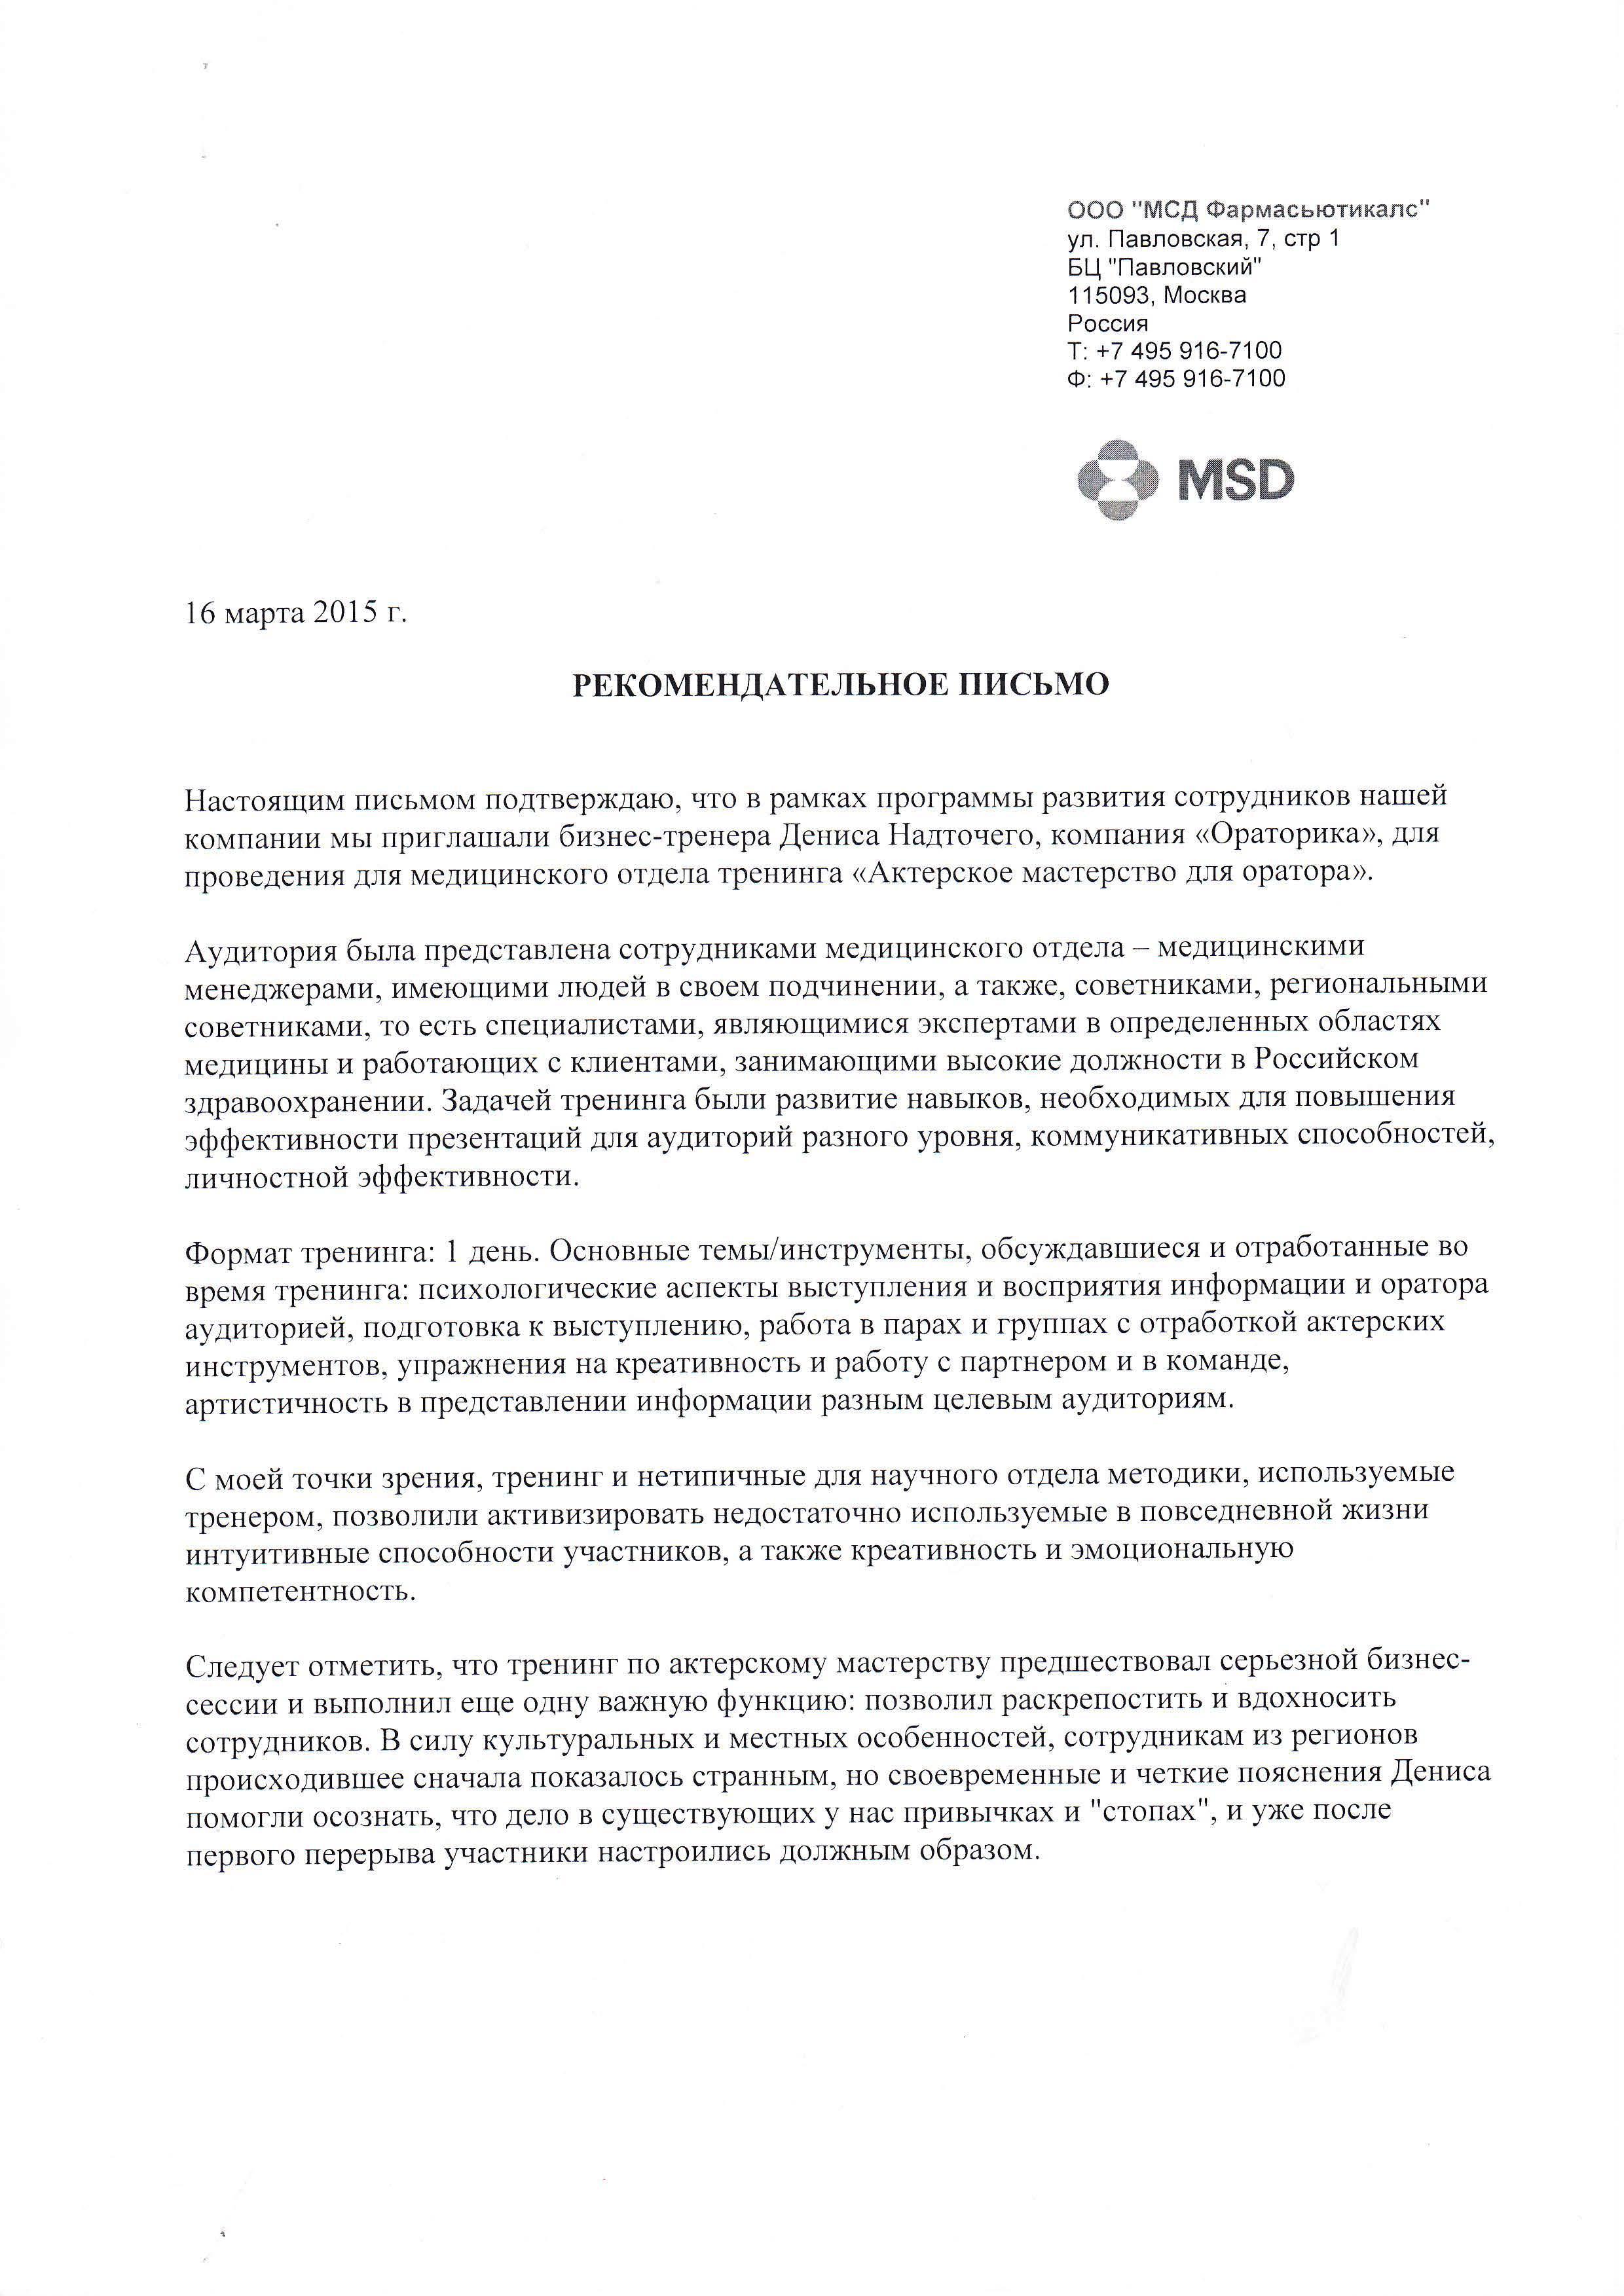 Отзыв MSD